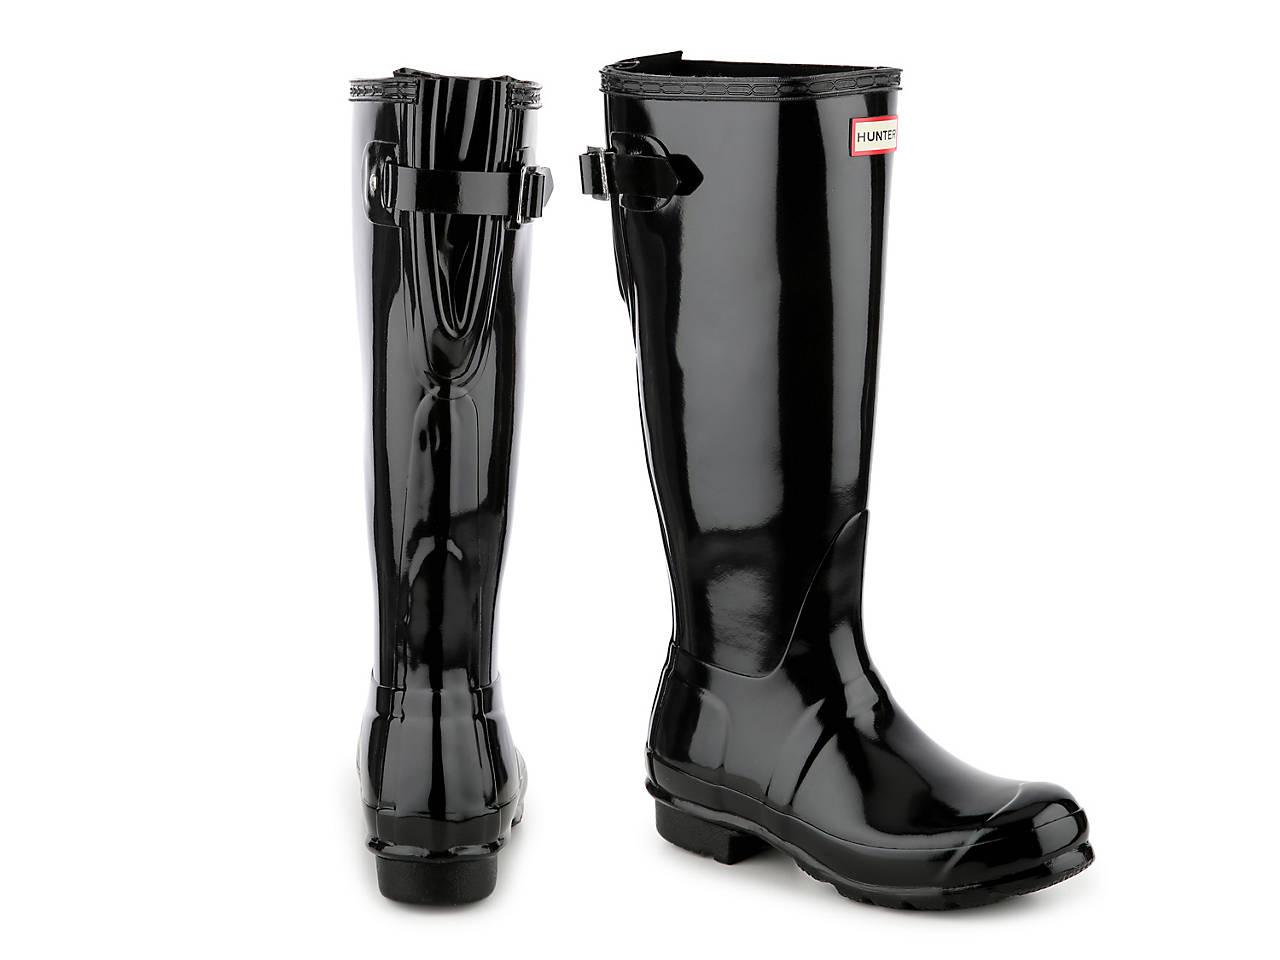 HUNTER Original Tall Gloss Back Adjustable Rain Boot Women s Shoes  976c258b61